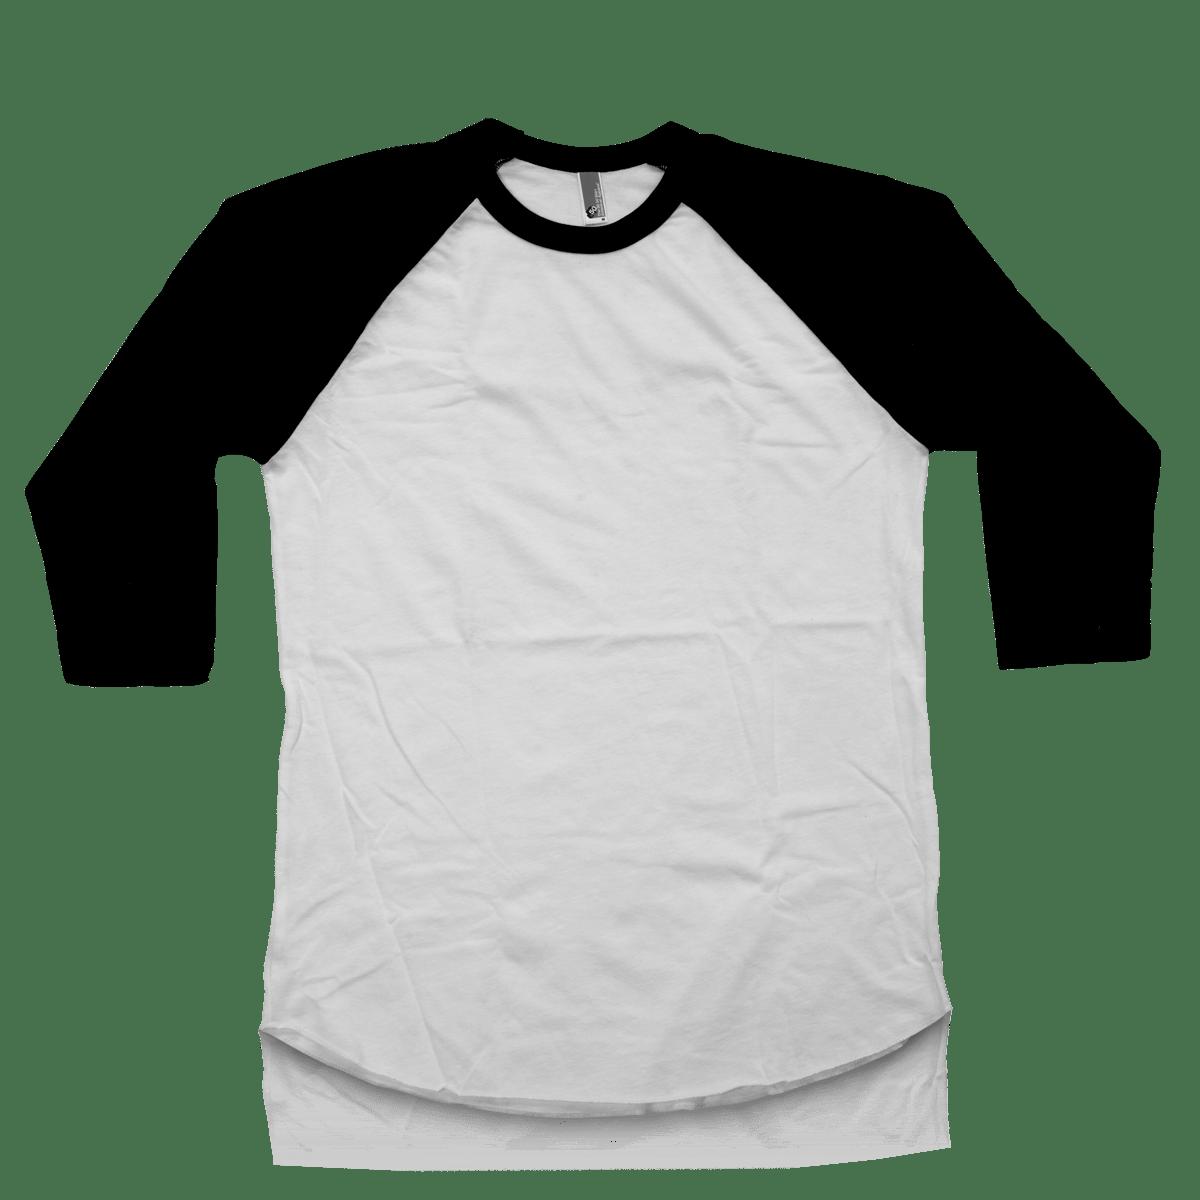 Black t shirt blank template - Black T Shirt Template For Photoshop Poly Cotton 3 4 Sleeve Raglan Shirt Download